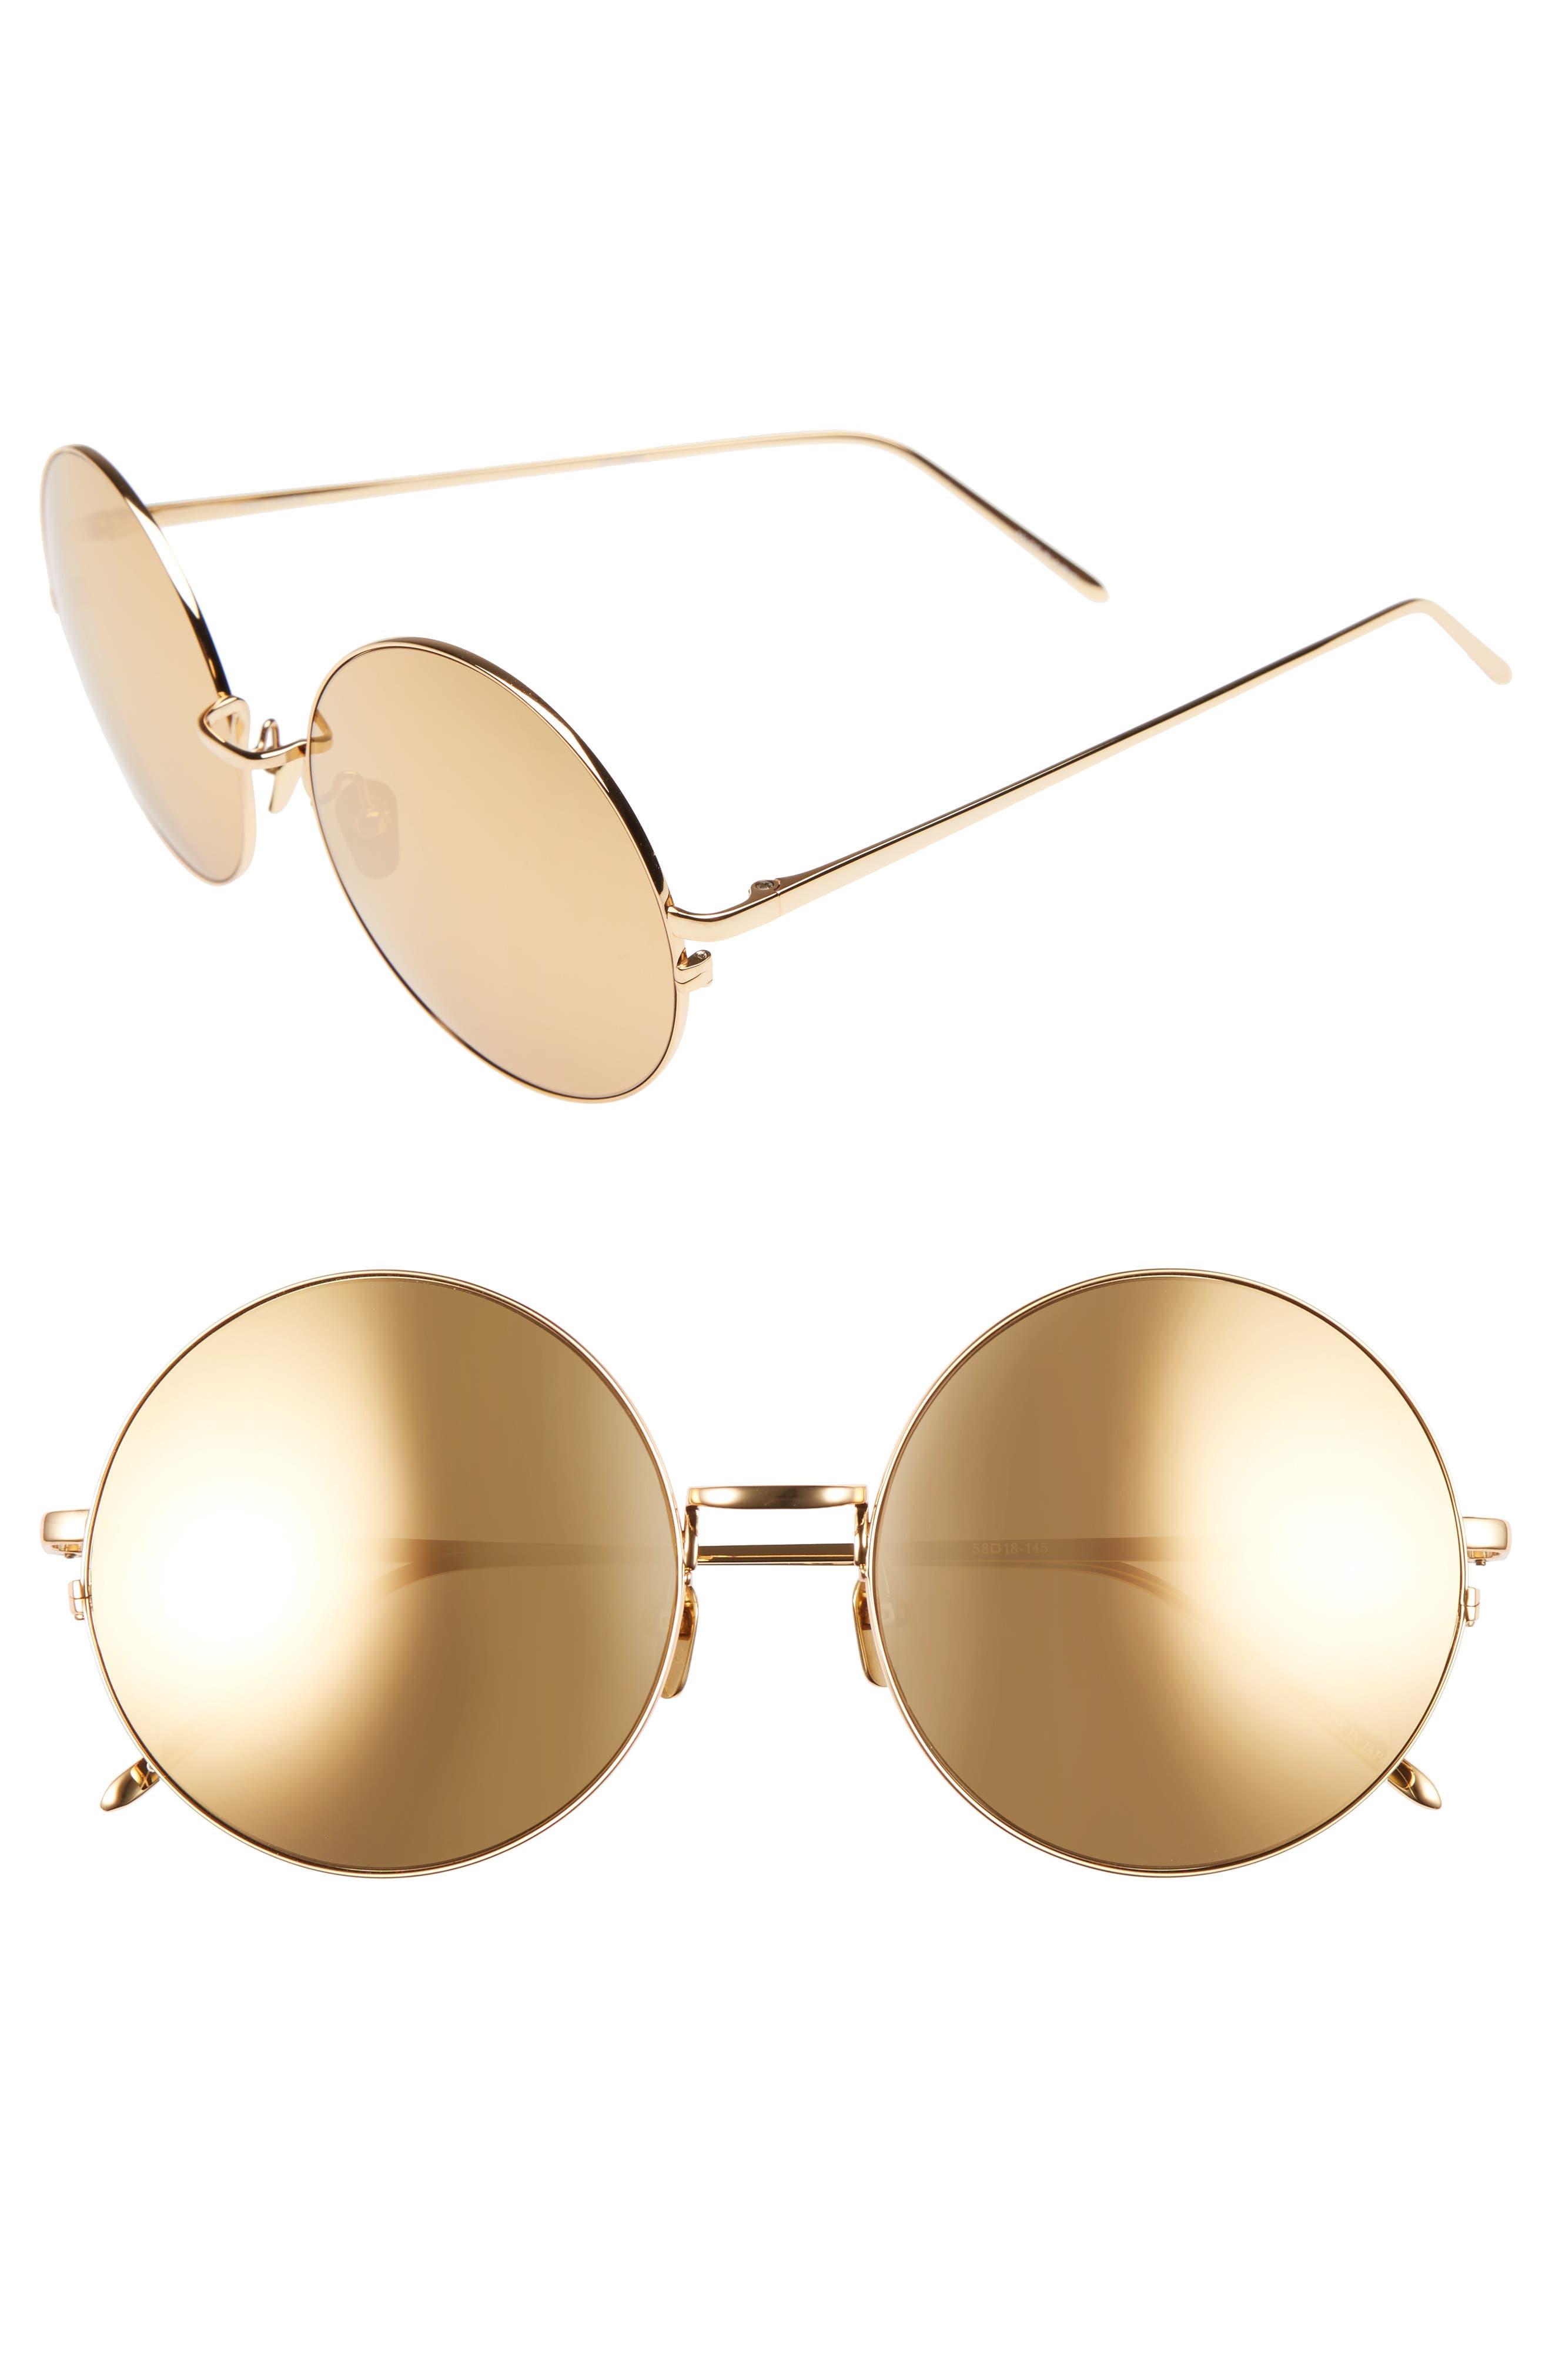 58mm 22 Karat Gold Trim Sunglasses,                         Main,                         color, 710